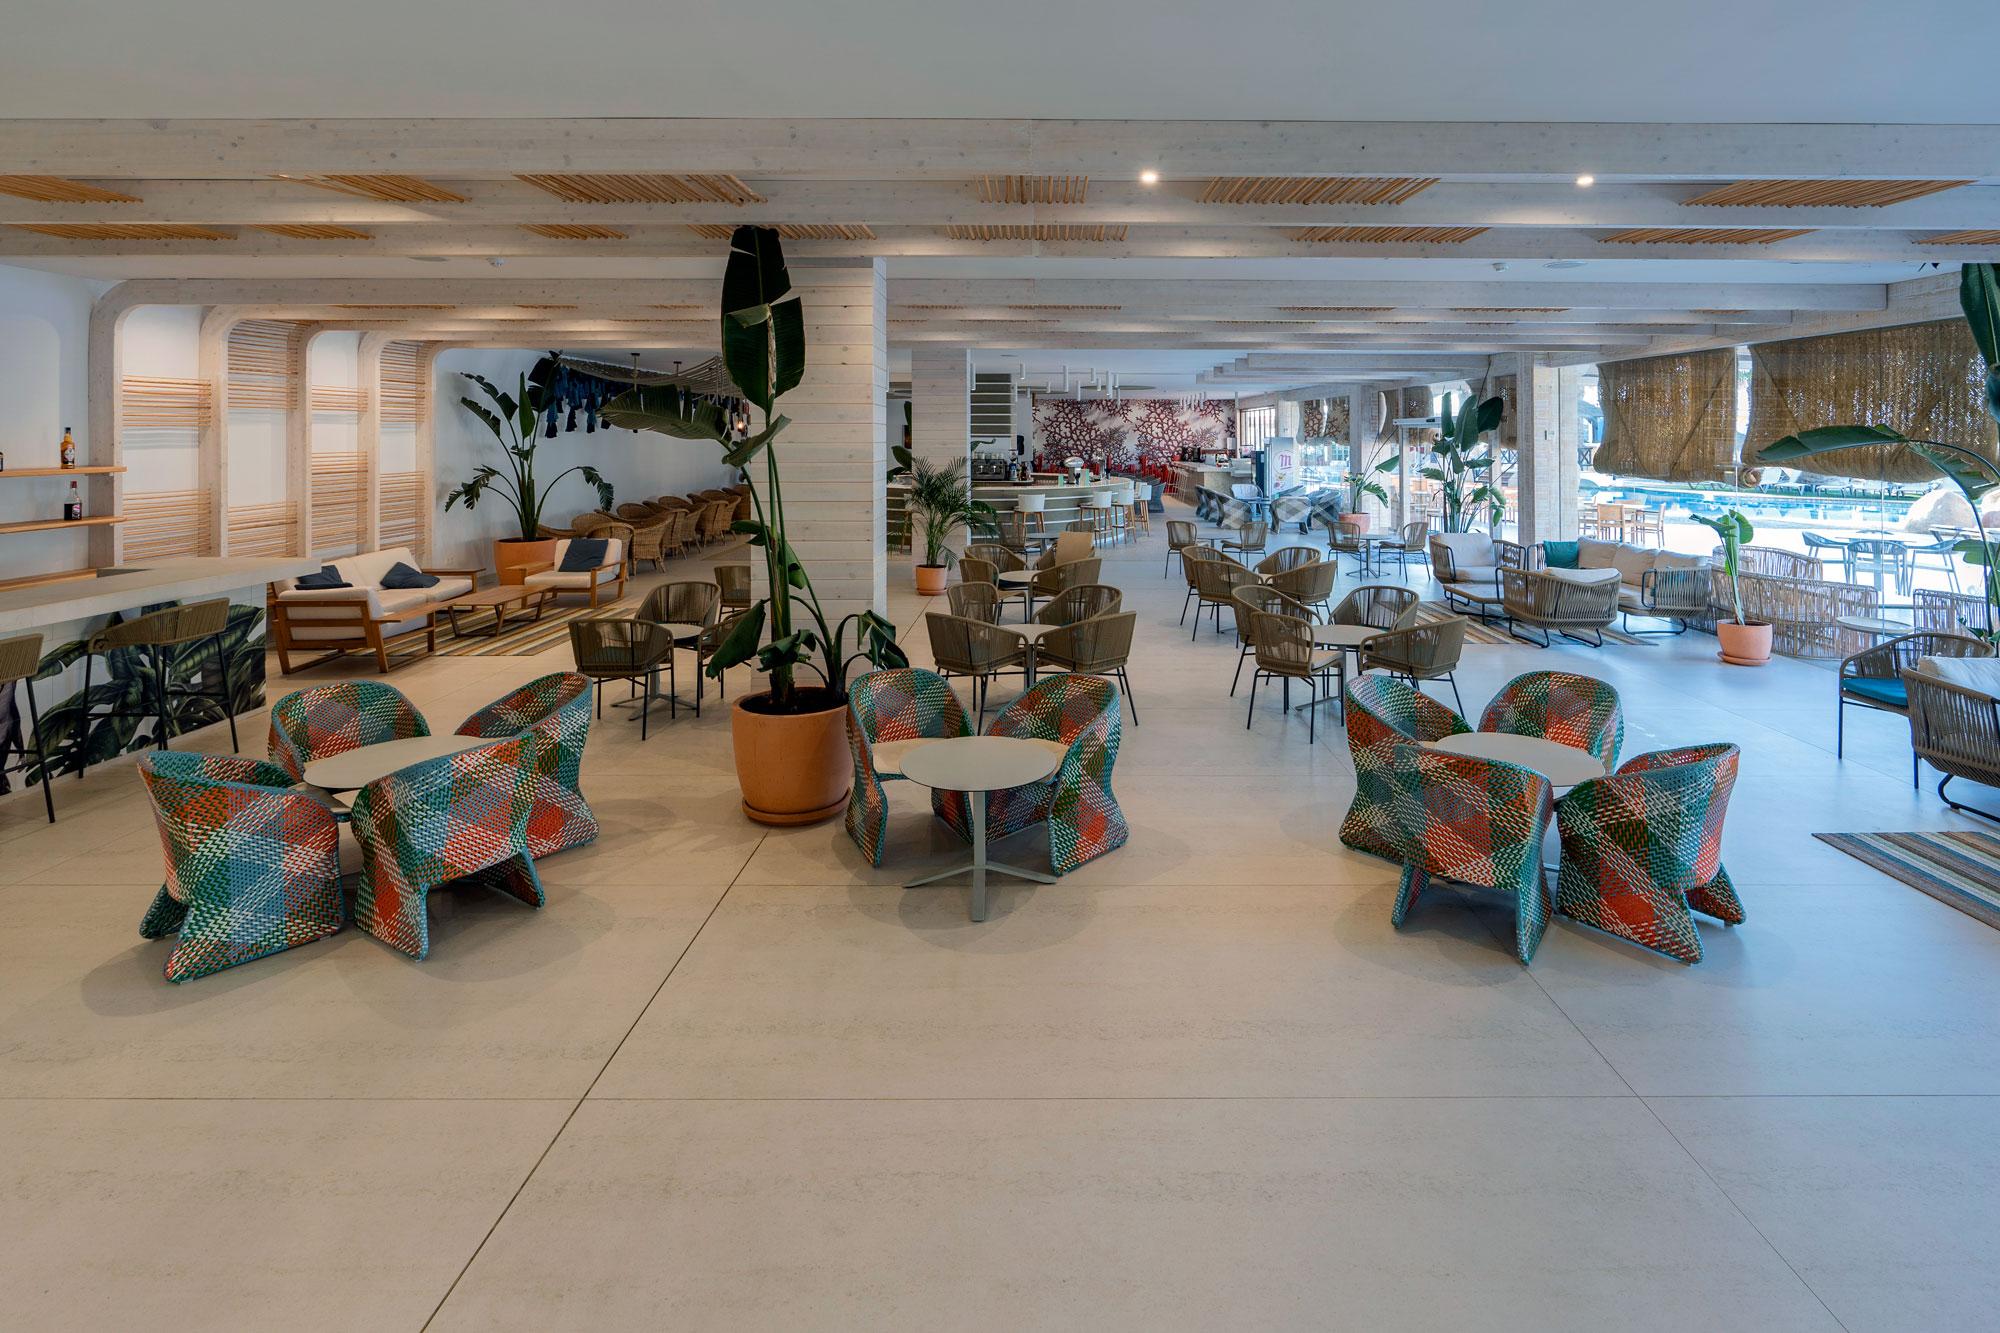 Hotel Mediterráneo  - Hotel Mediterraneo Park 8 Dekton Silestone Piedra Natural Cosentino 188